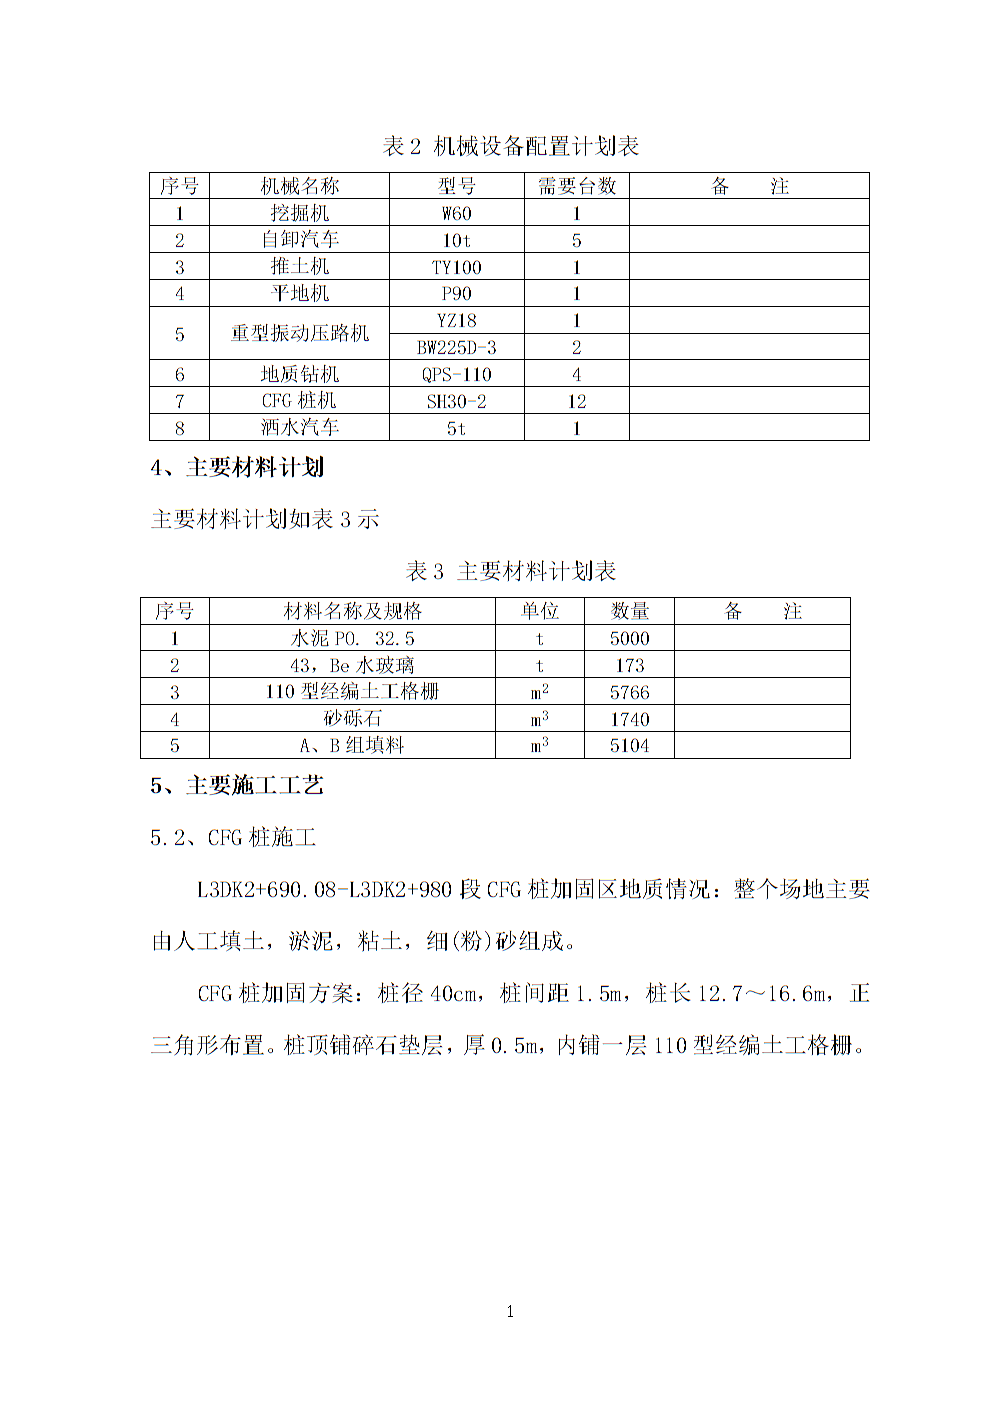 CFG桩、水泥搅拌桩施工方案.doc